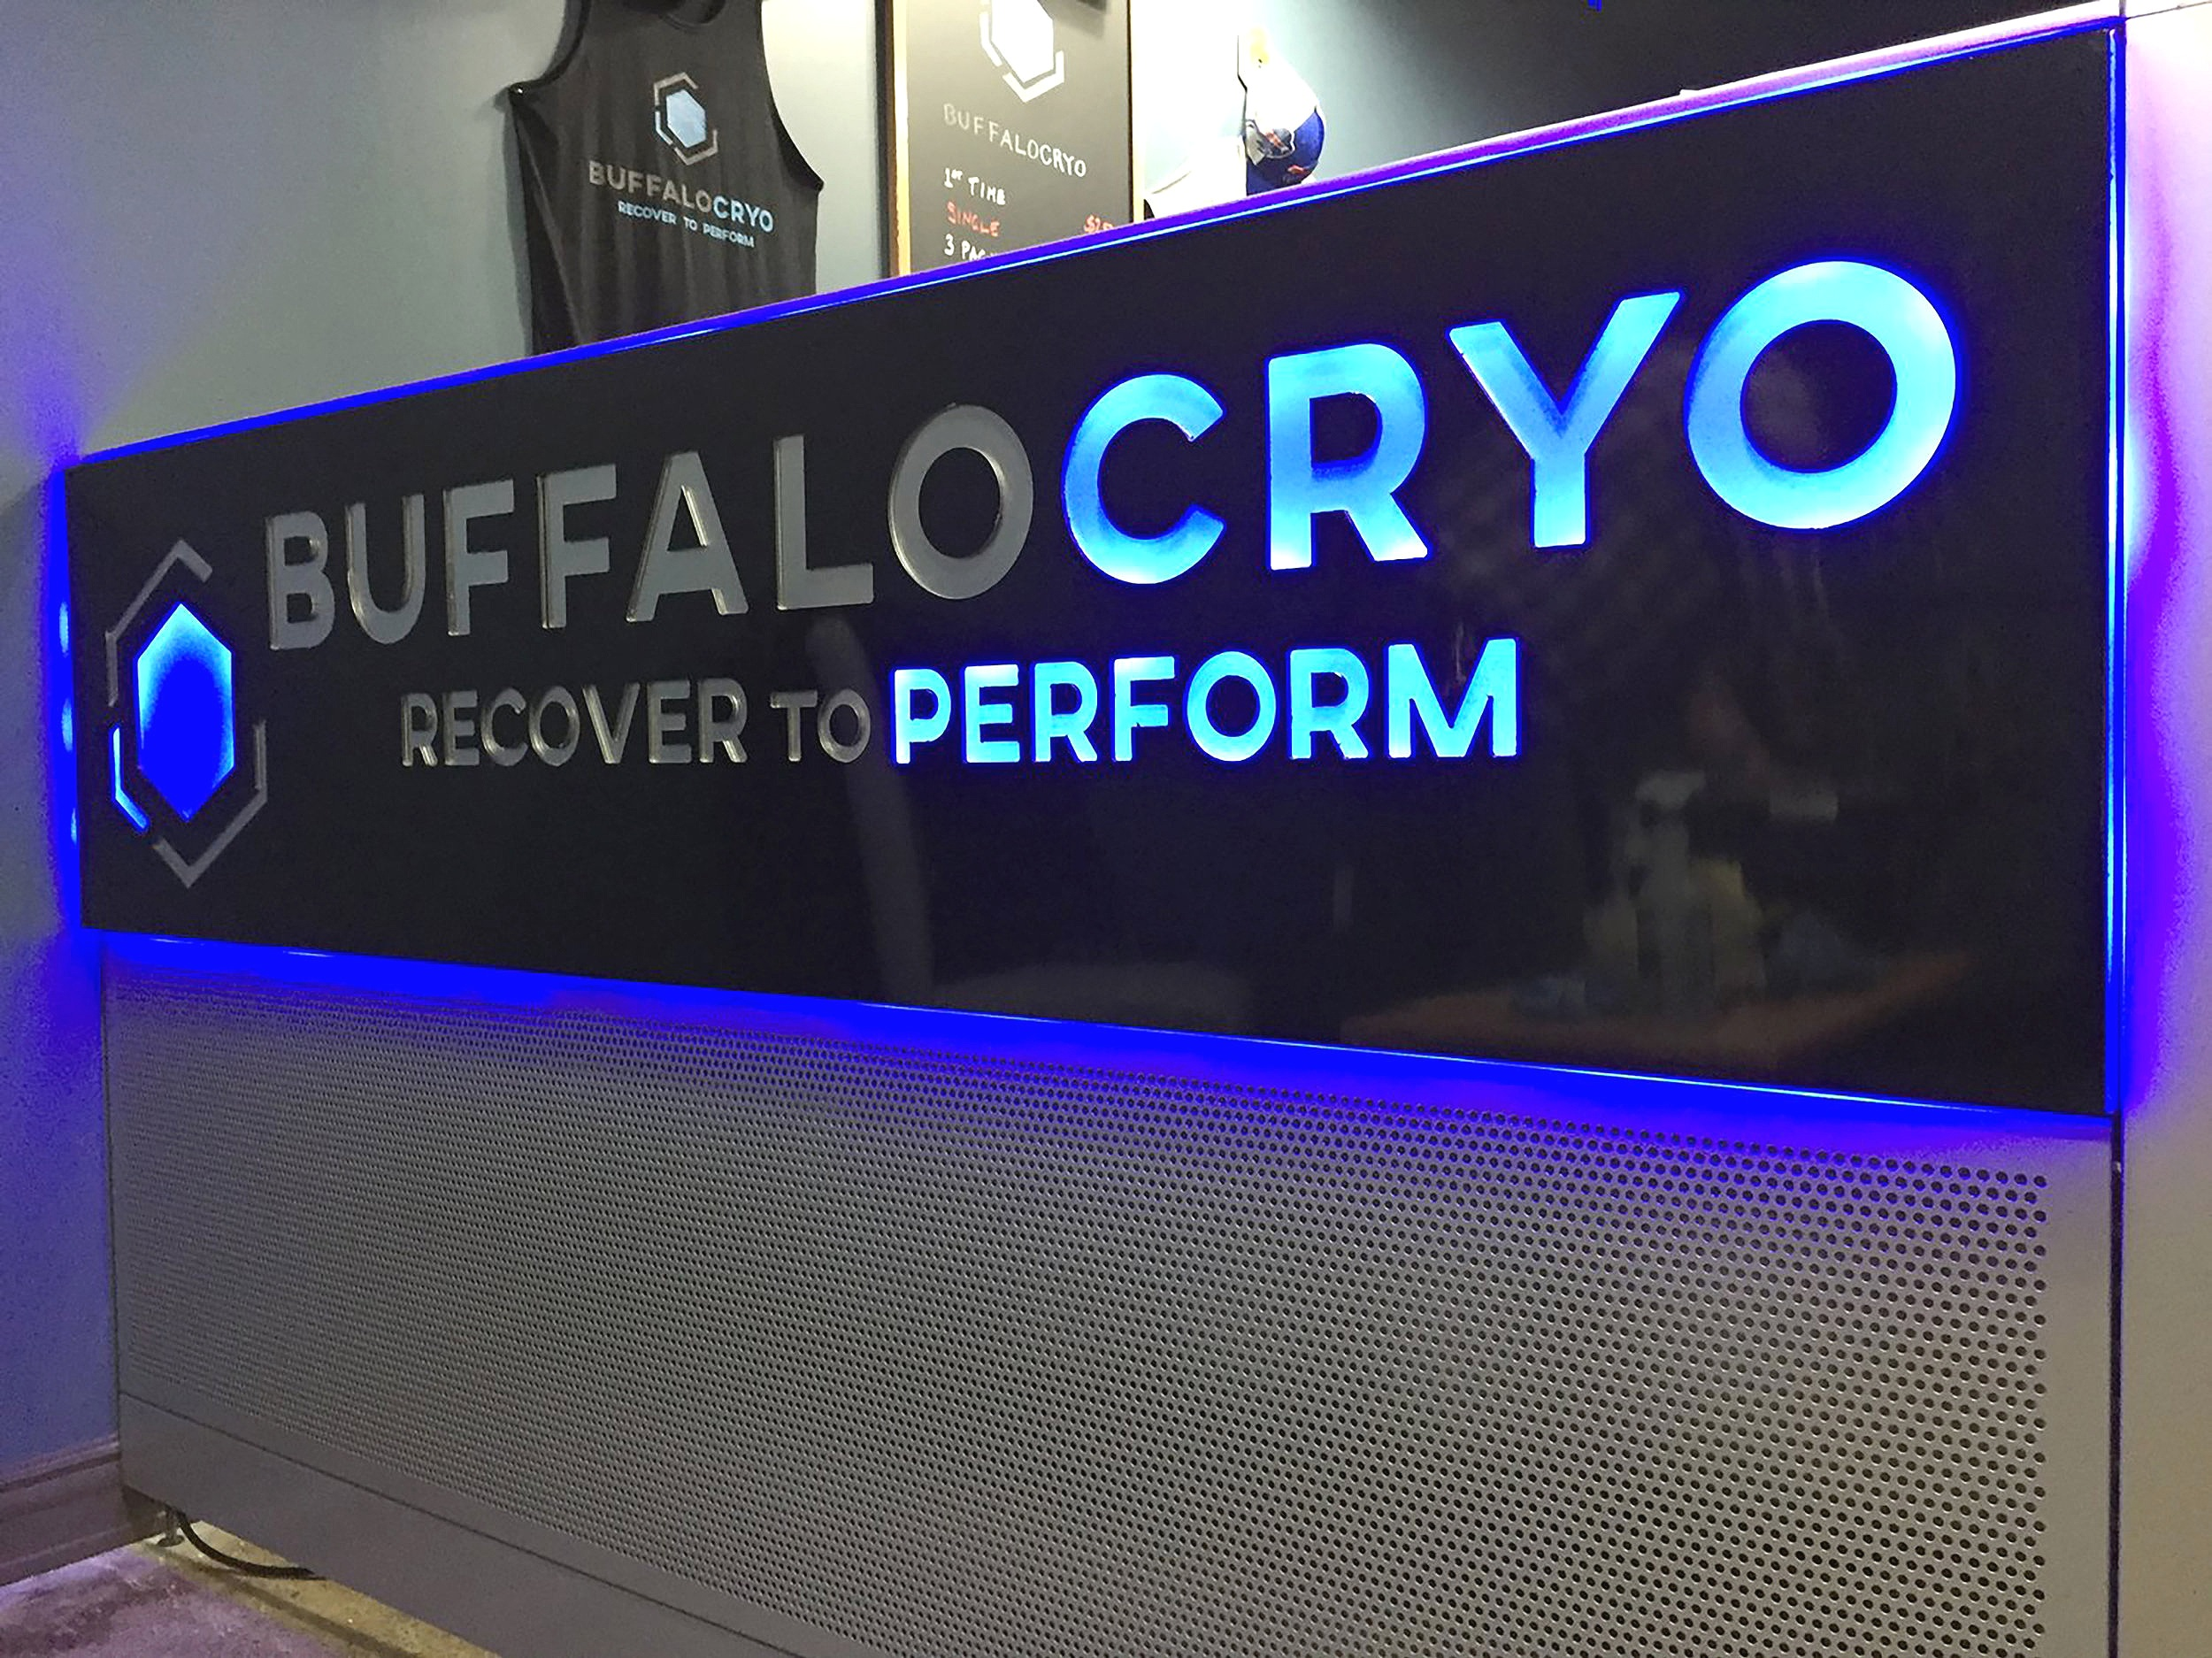 Buffalo Cryo - Backlit Acrylic and Brushed Metal Reception Display